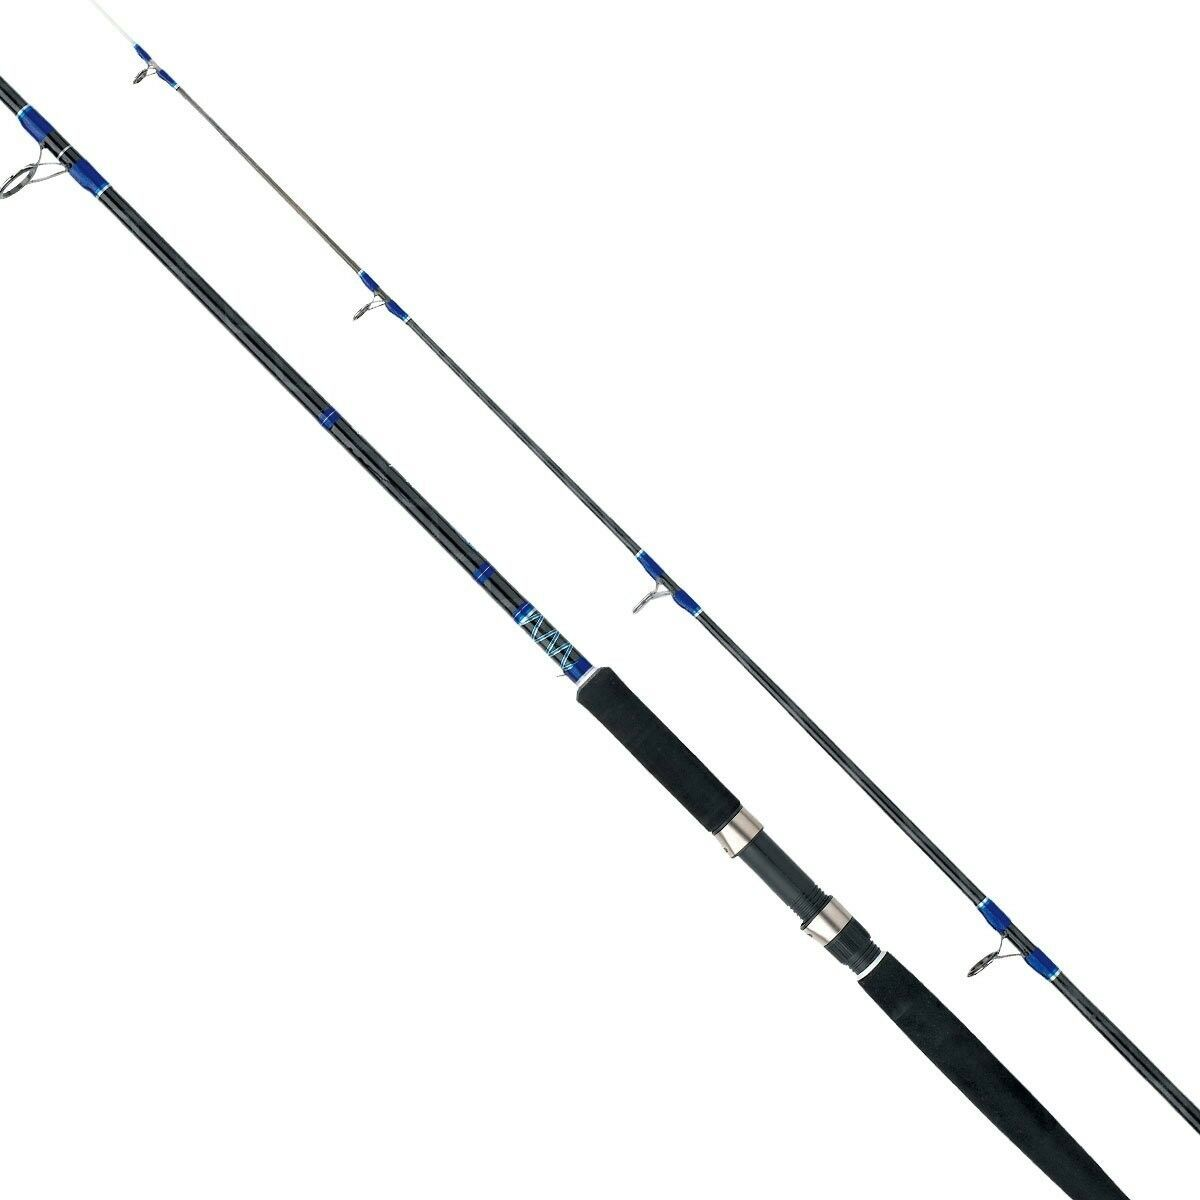 Ron Thompson Hard Core II Spinning Fishing Lure Rod - 9ft 10-40g - 29544